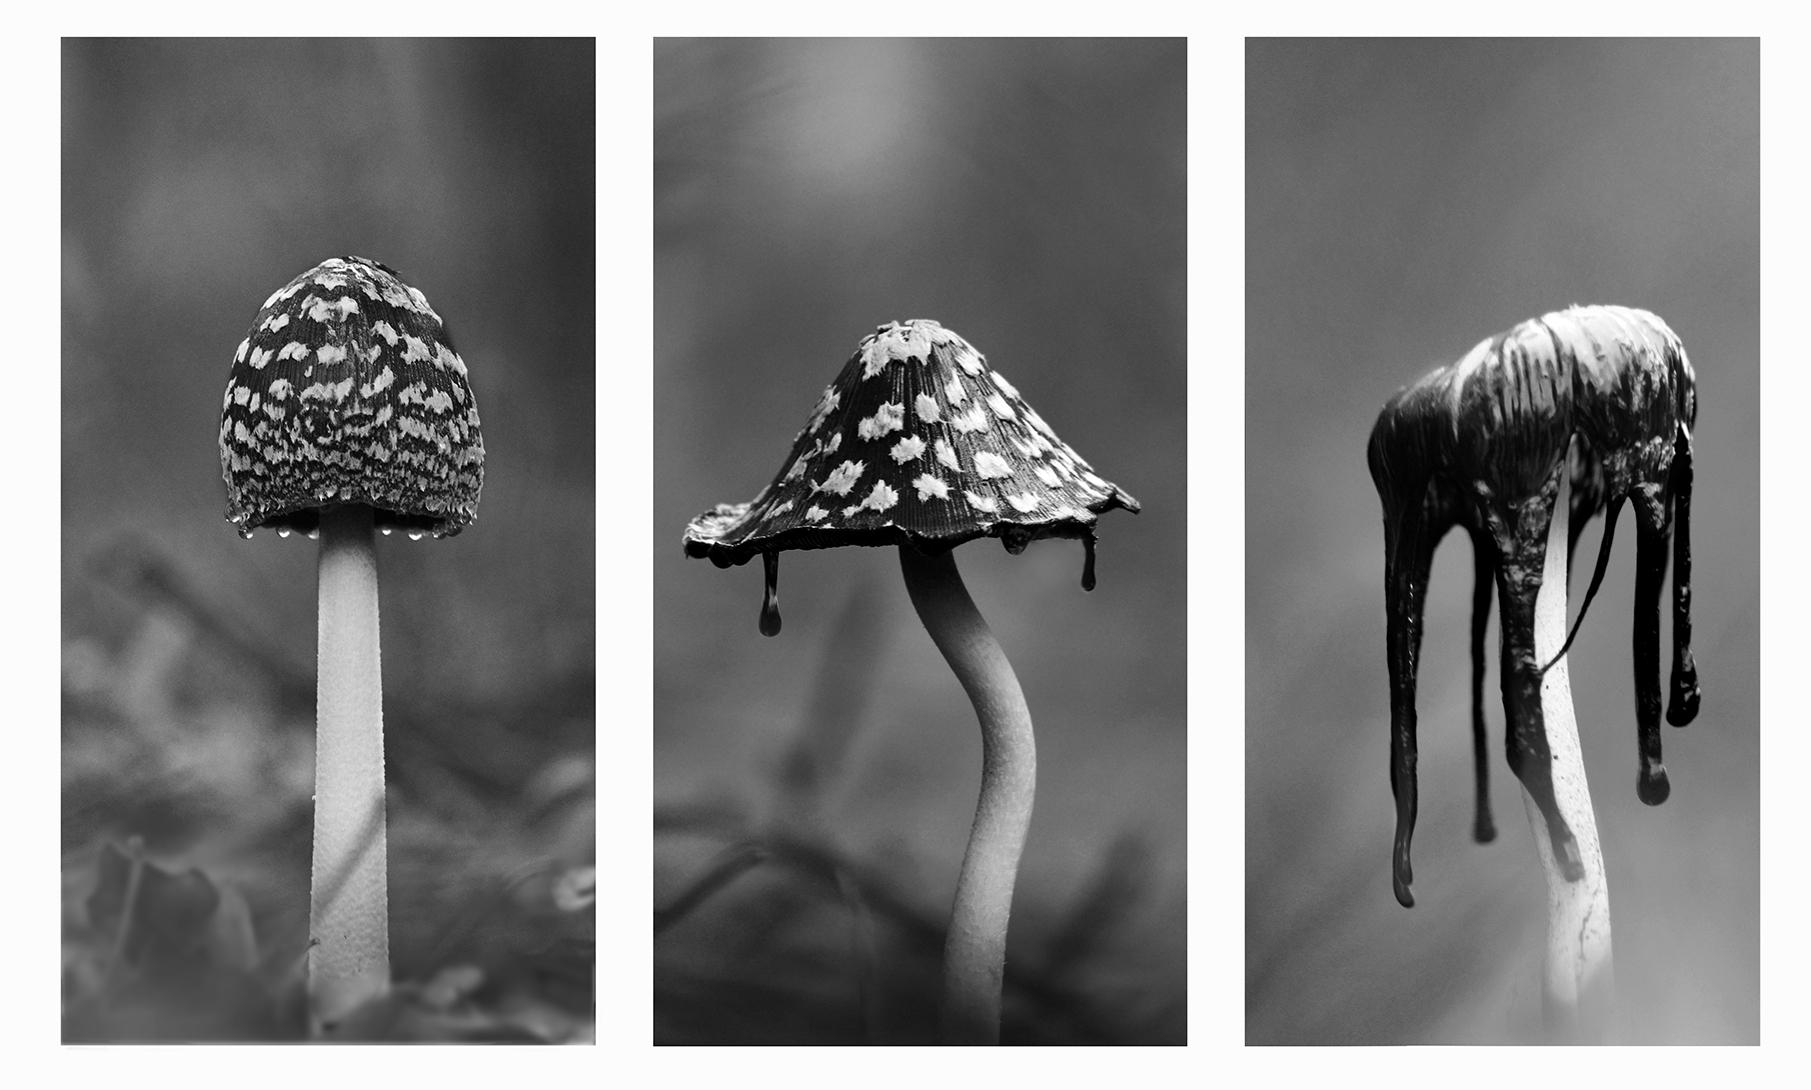 Житието на гъбката | Author Petar Belev - nislon | PHOTO FORUM